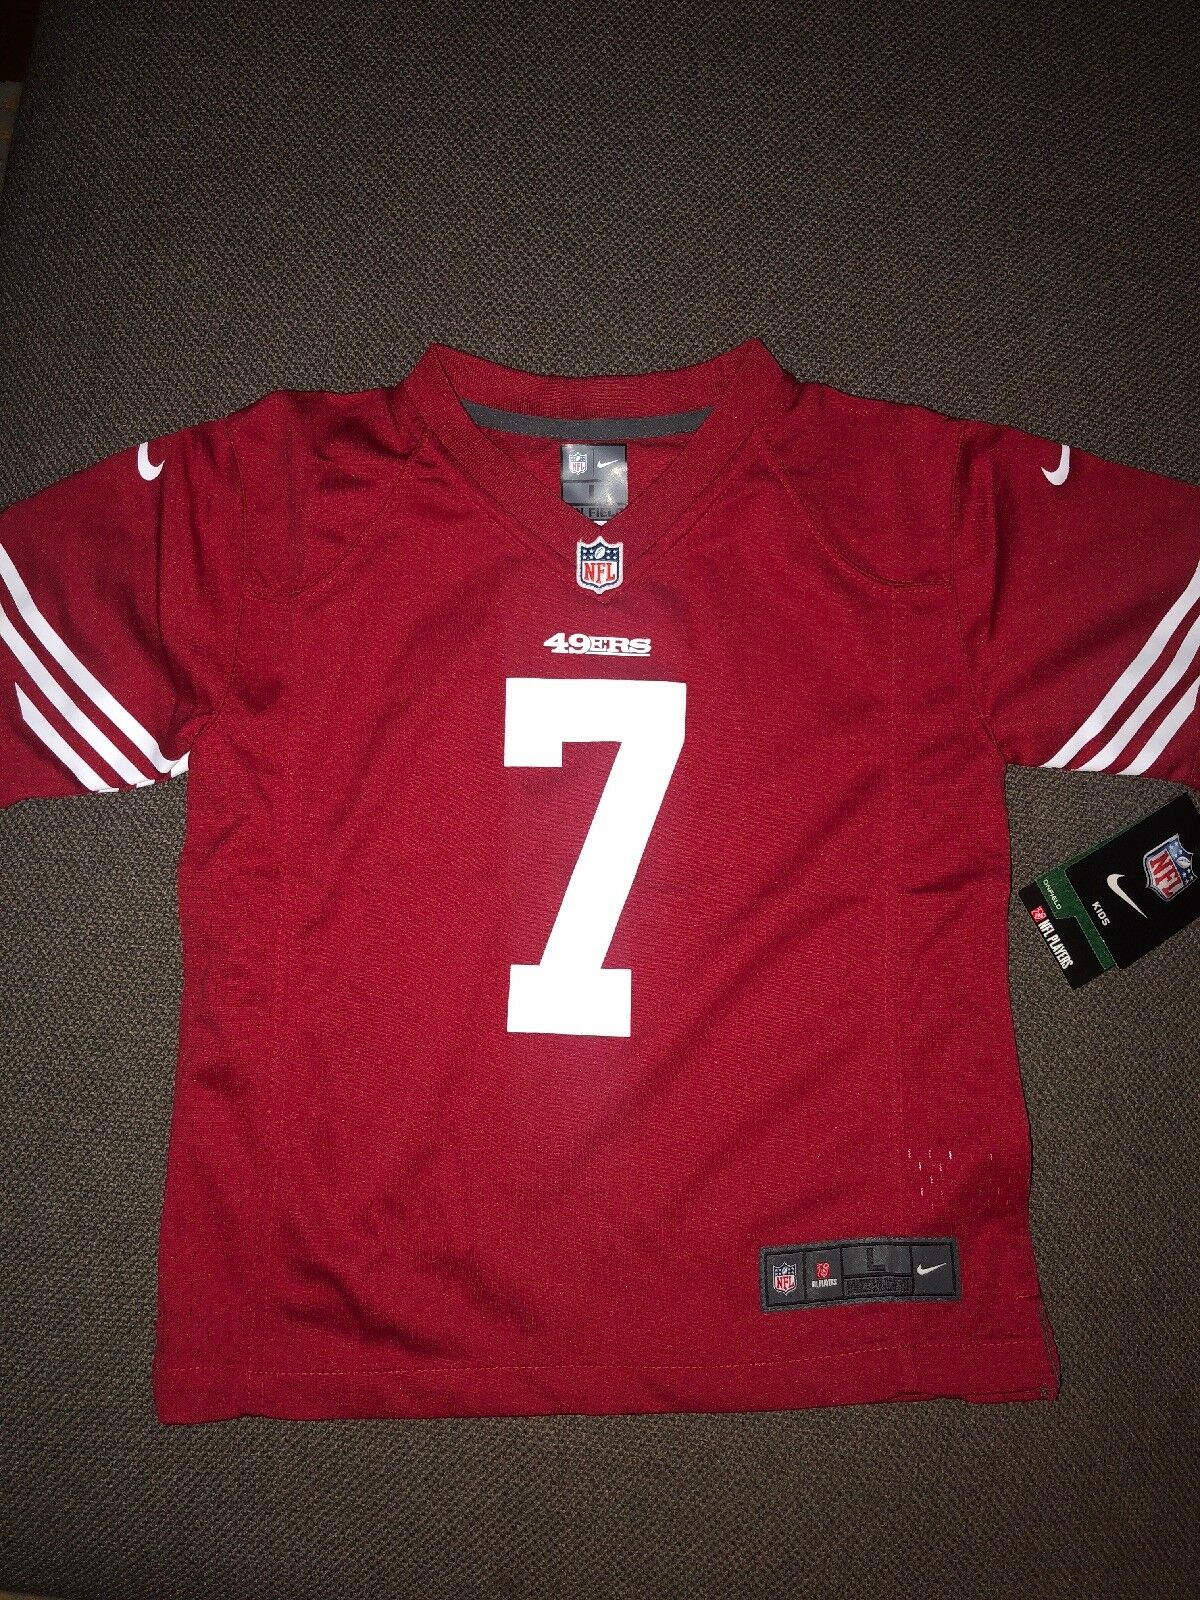 new product 5bc34 a40c7 Z1b3n9p9 Kids Nike NFL San Francisco 49ers Colin Kaepernick Jersey Sz L Red